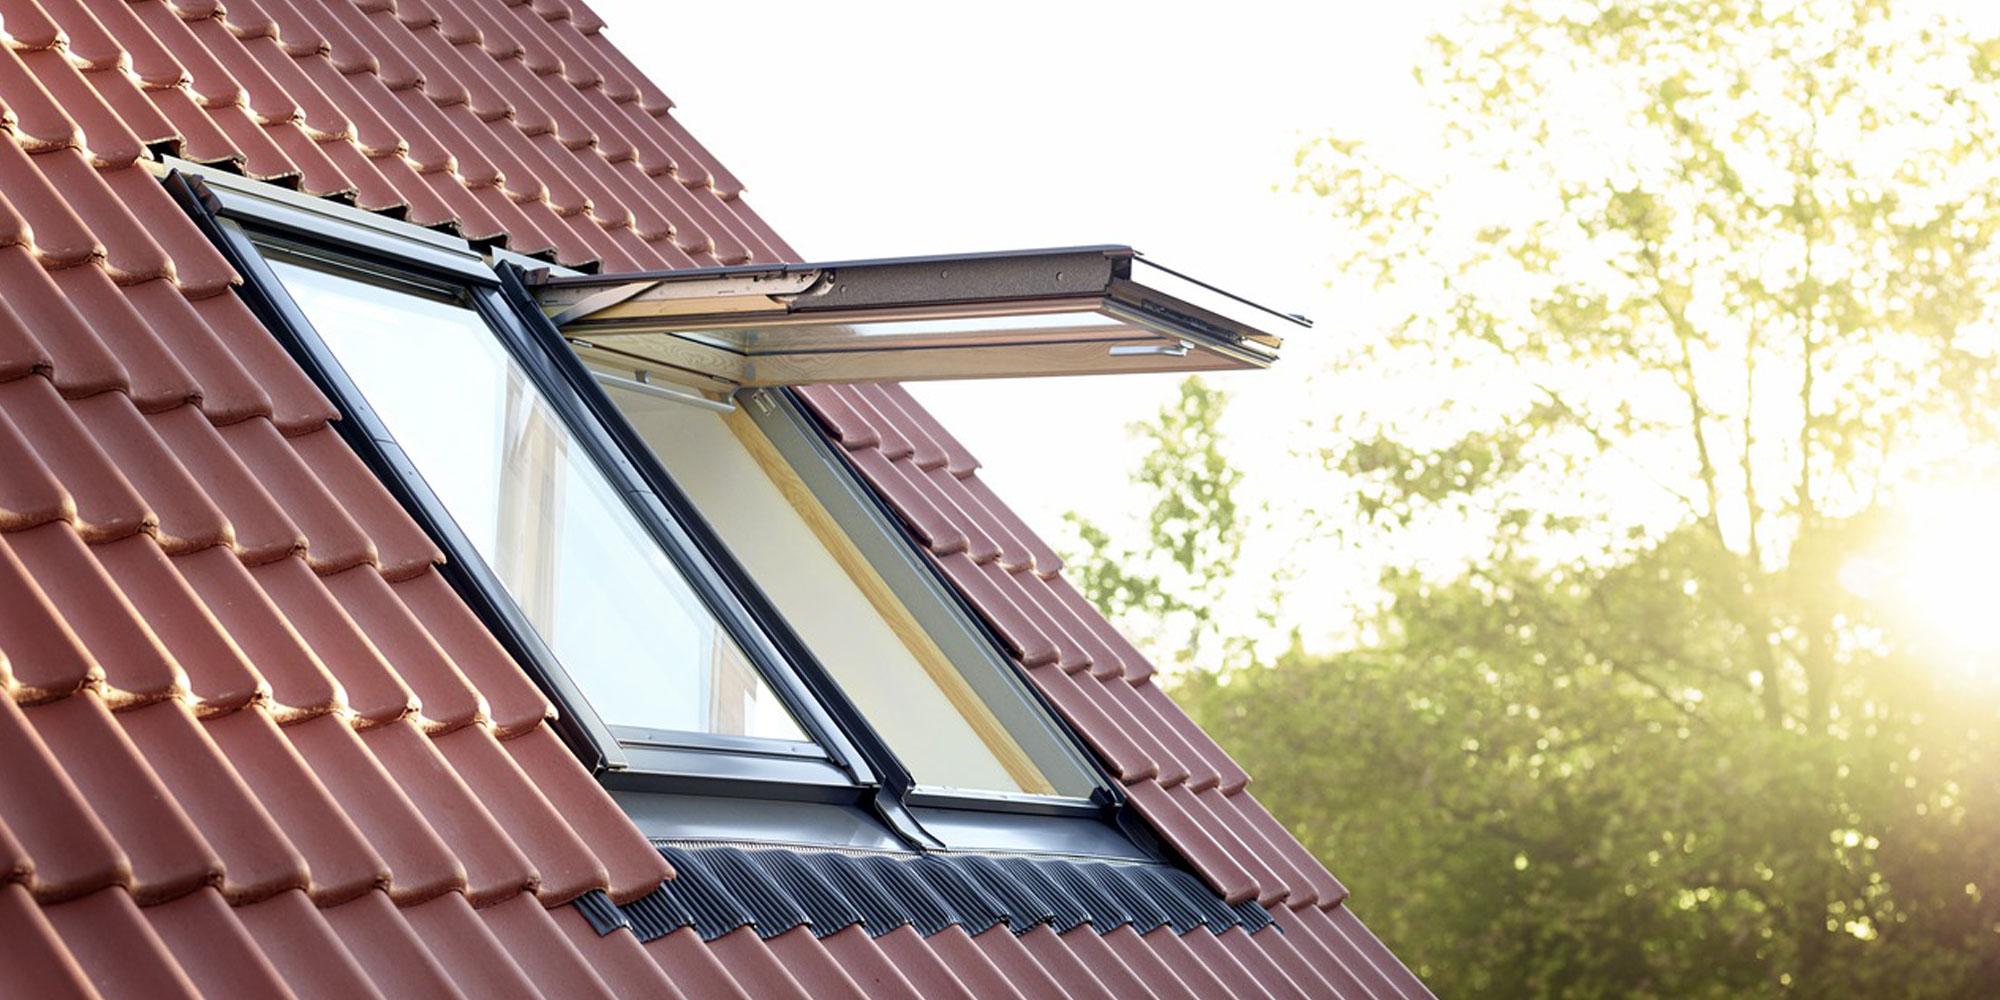 Prodotti sistemi oscuranti velux agedil srl for Oscuranti per finestre velux